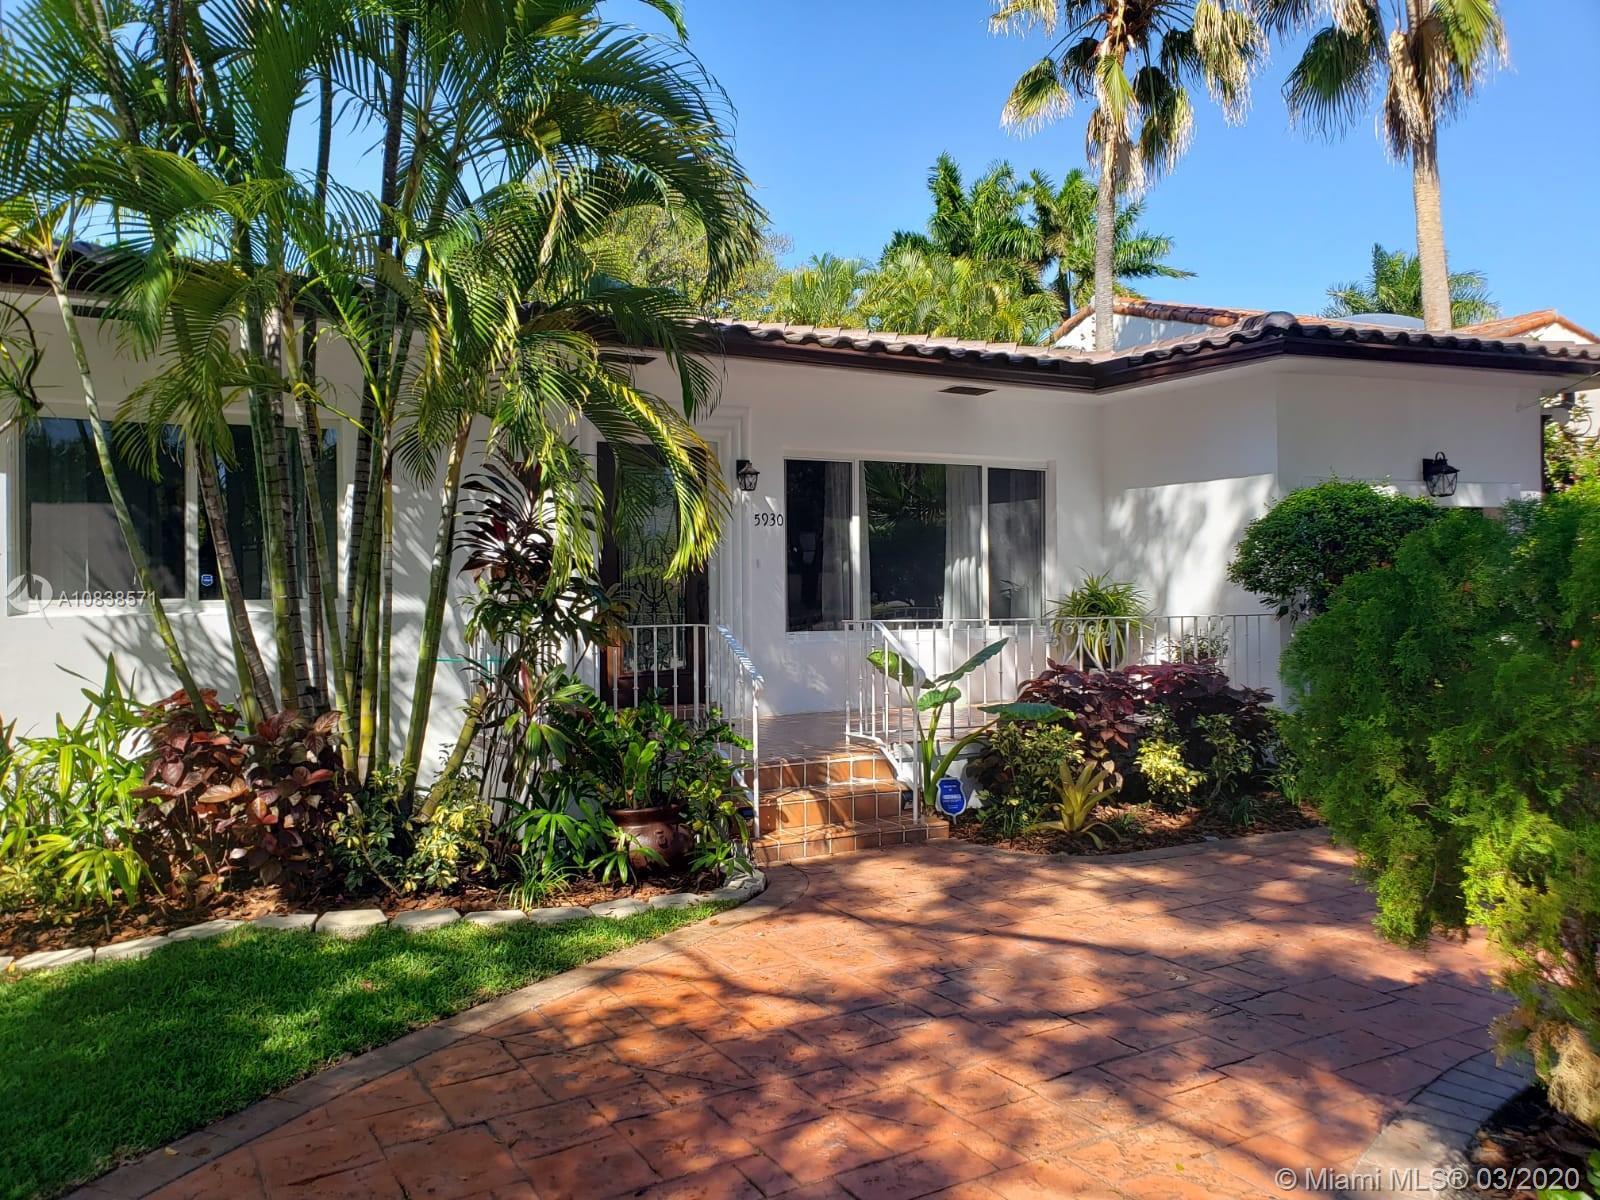 5930 Alton Rd, Miami Beach, Florida 33140, 3 Bedrooms Bedrooms, ,3 BathroomsBathrooms,Residential Lease,For Rent,5930 Alton Rd,A10838571